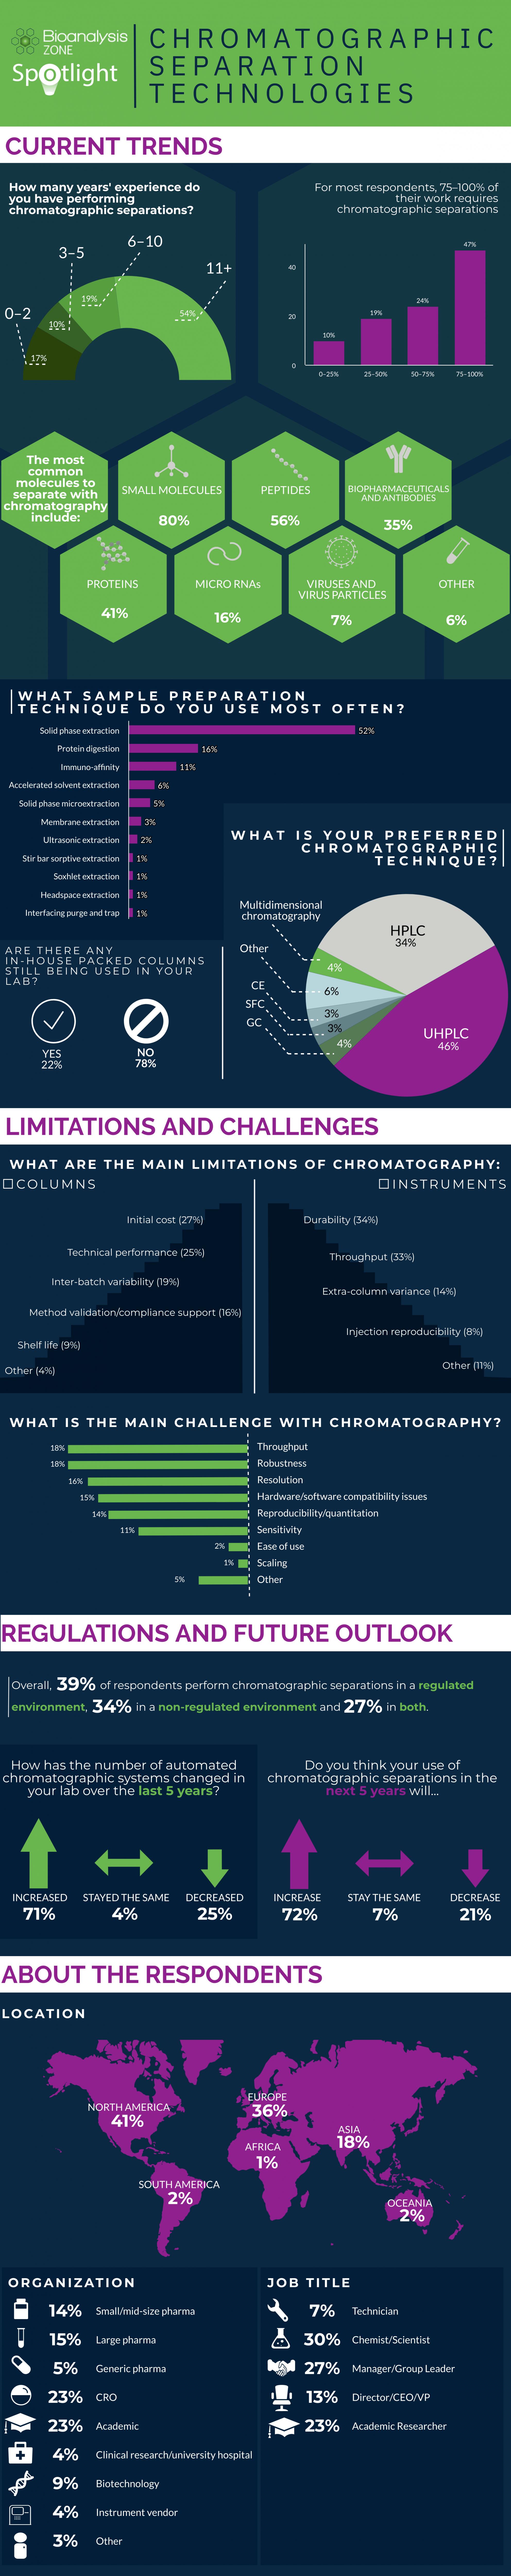 chromatographic seperation technologies-survey-infographic